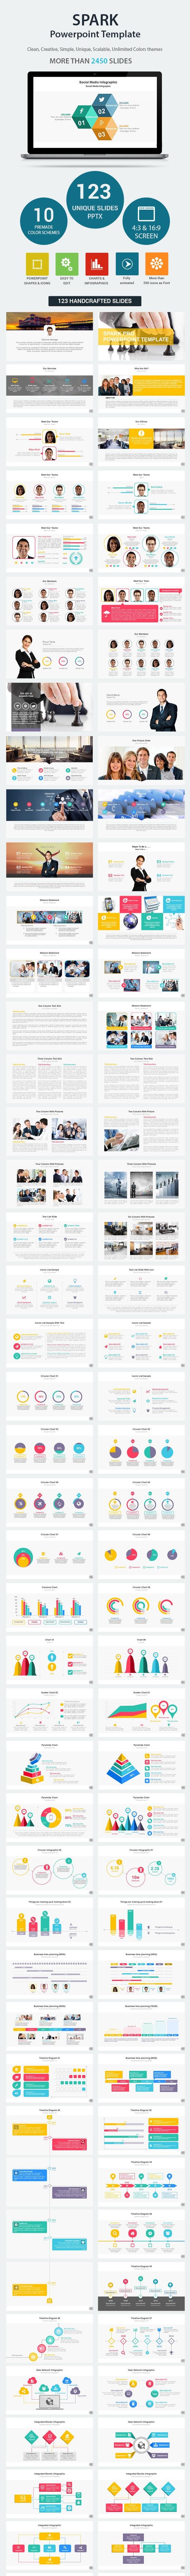 Spark PowerPoint Presentation Template - Business PowerPoint Templates